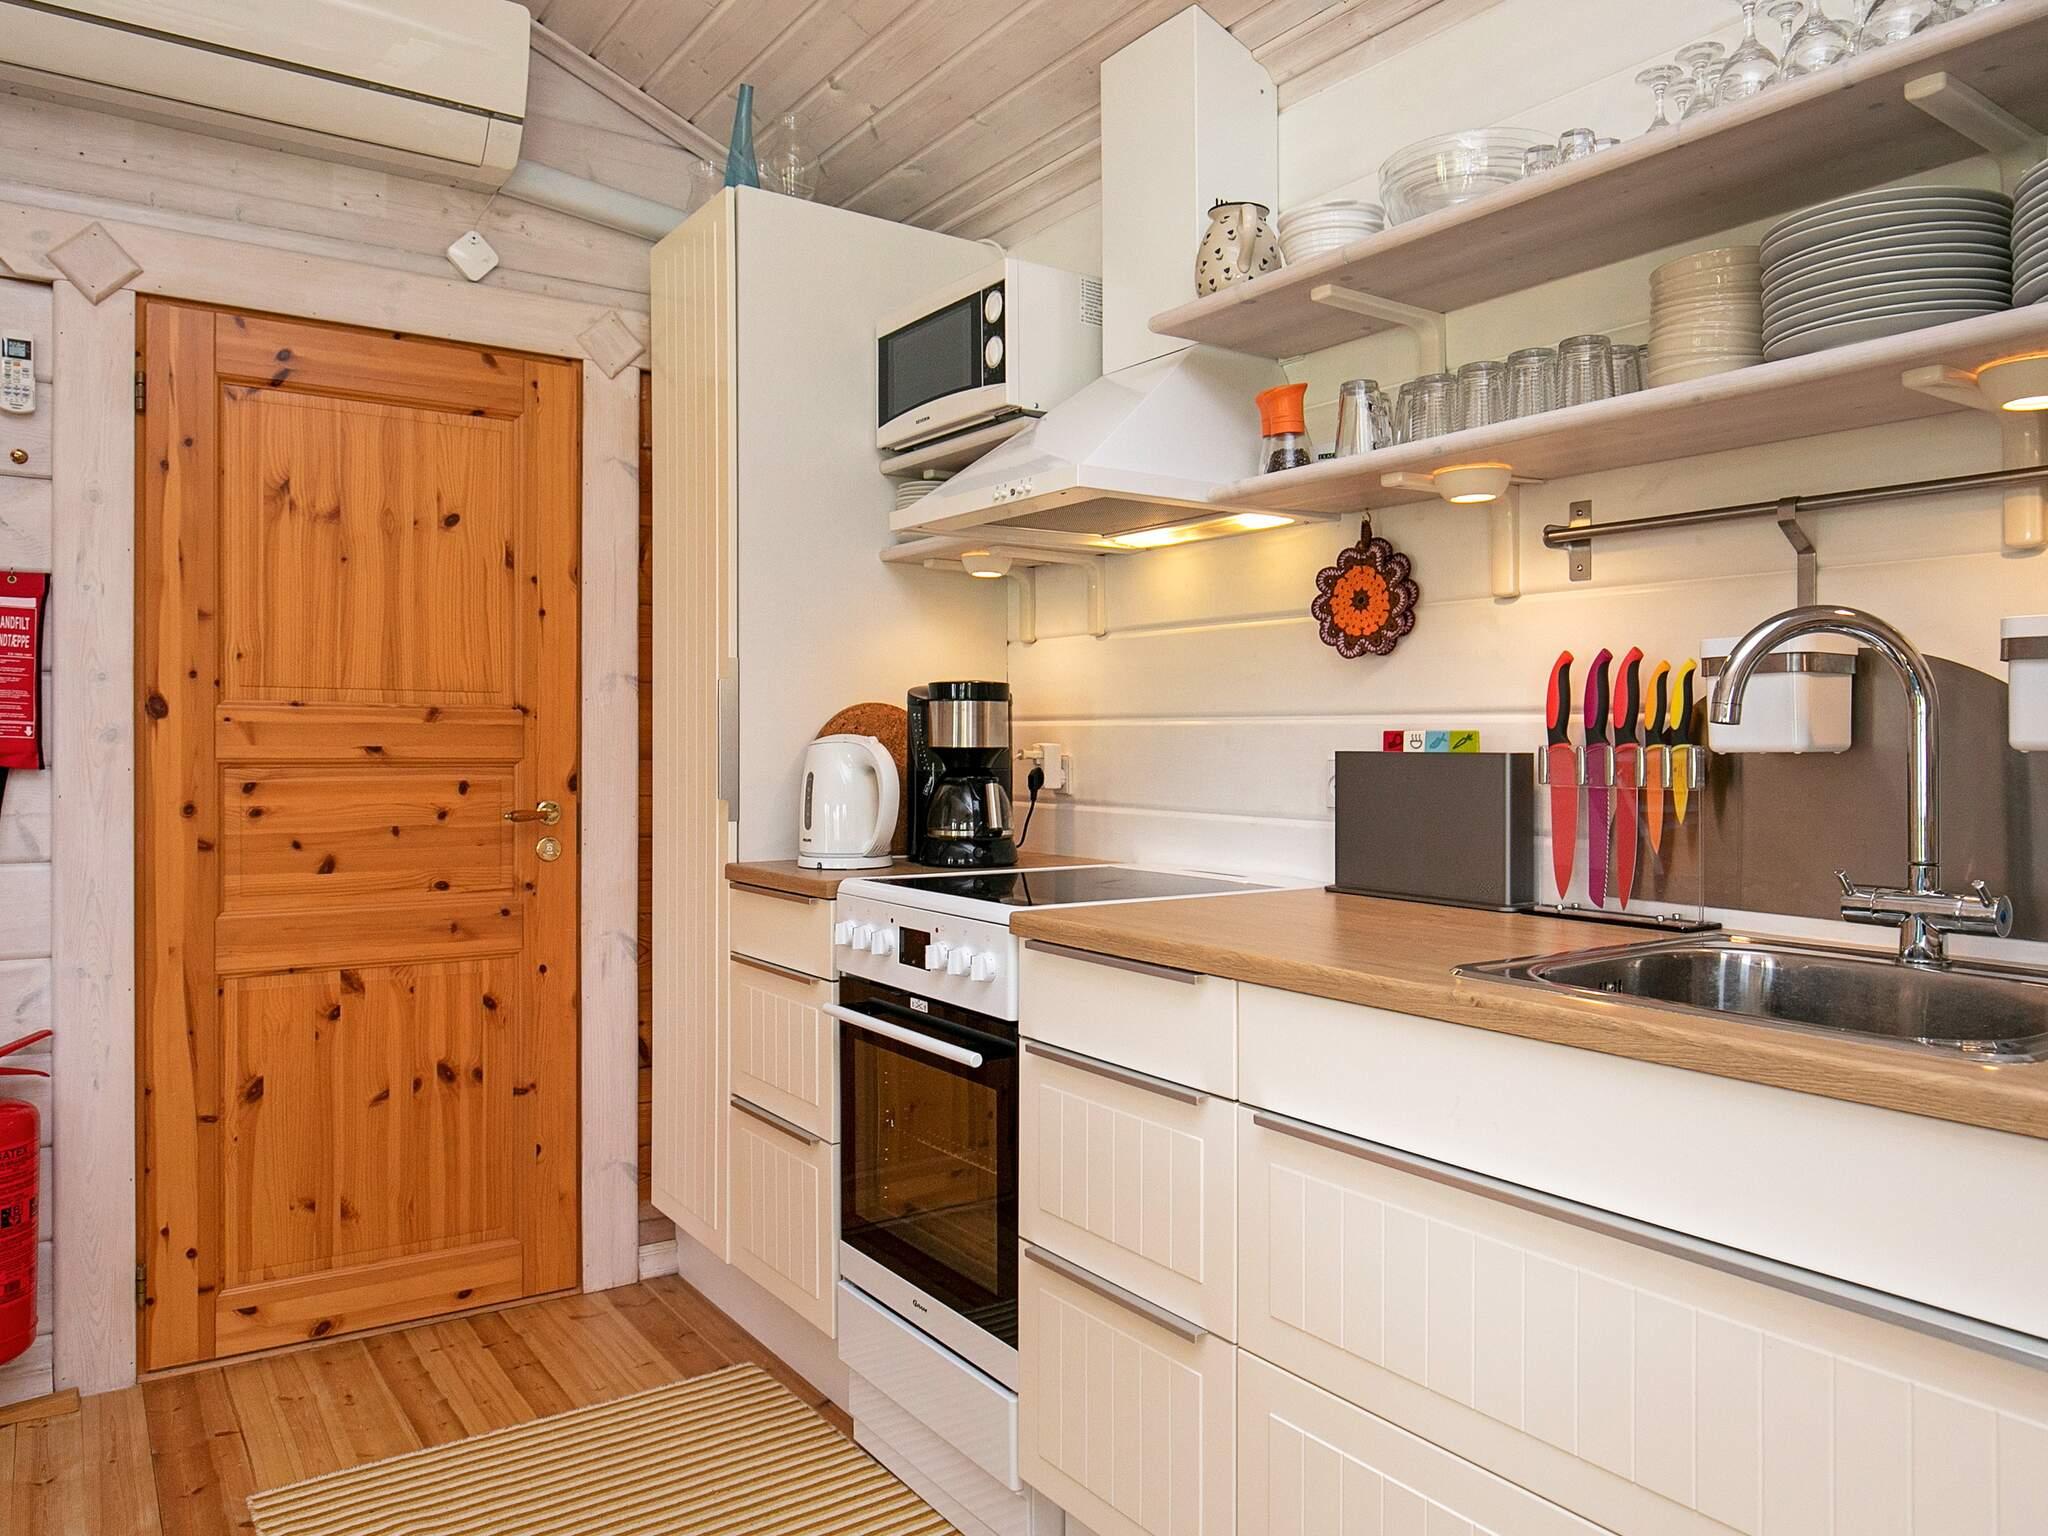 Maison de vacances Eskov Strandpark (603988), Roslev, , Limfjord, Danemark, image 5